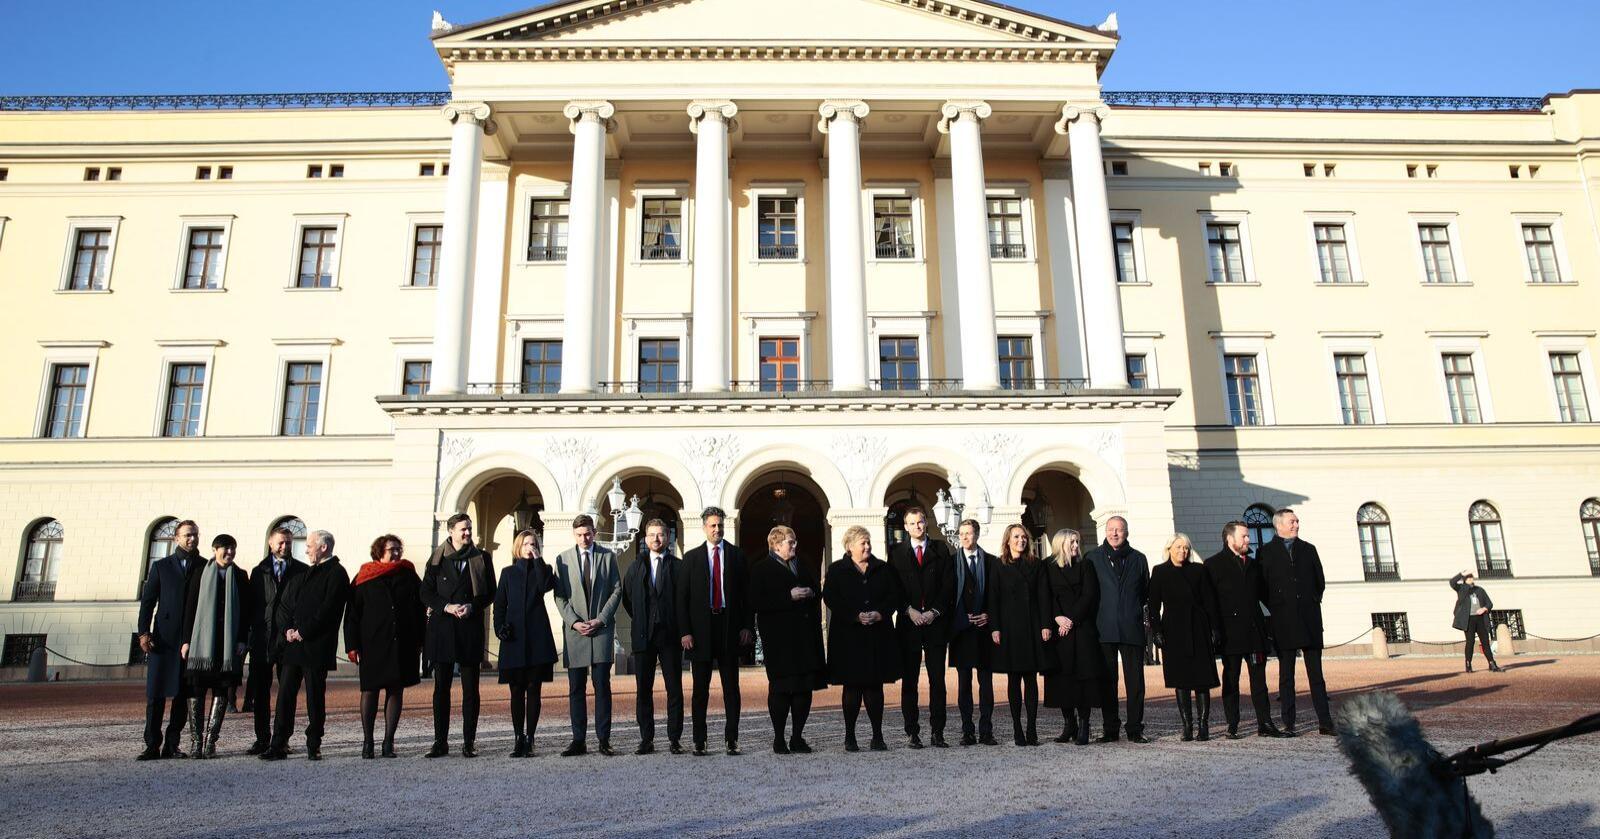 Solbergs nye regjering ble presentert fredag. Foto: Håkon Mosvold Larsen / NTB scanpix